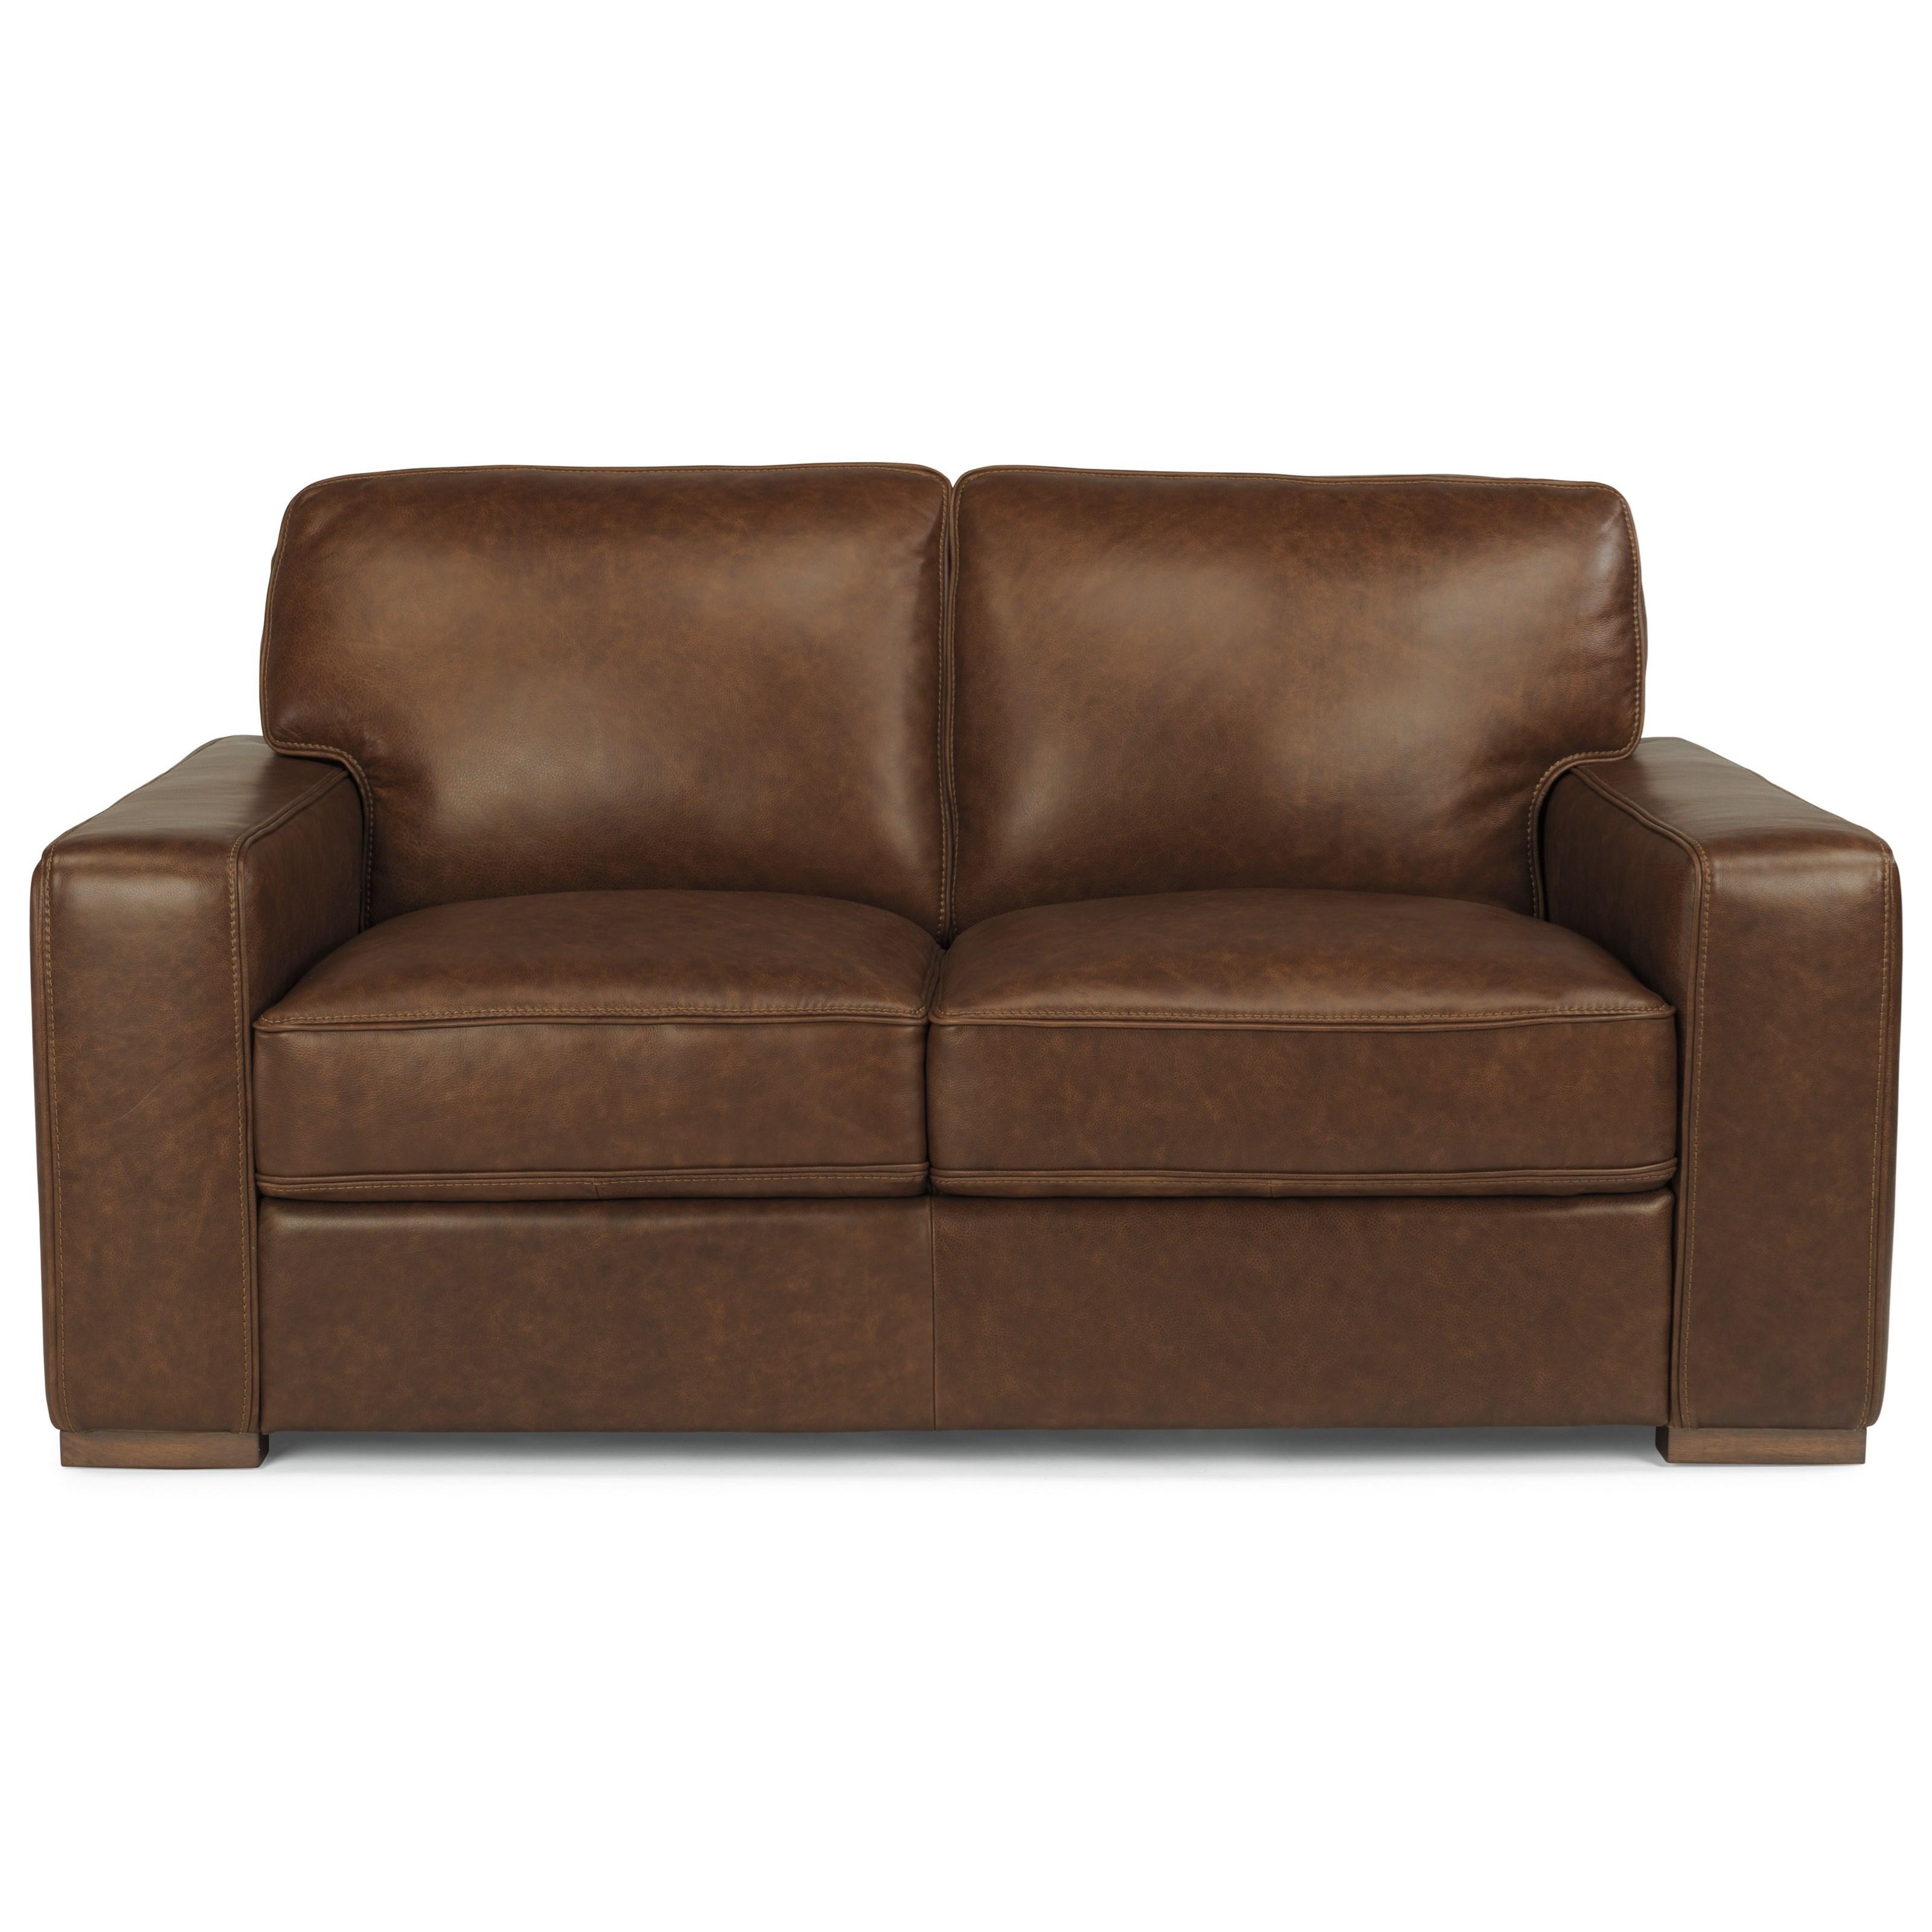 Flexsteel Latitudes-Mckinley Leather Loveseat  - Item Number: 1349-20